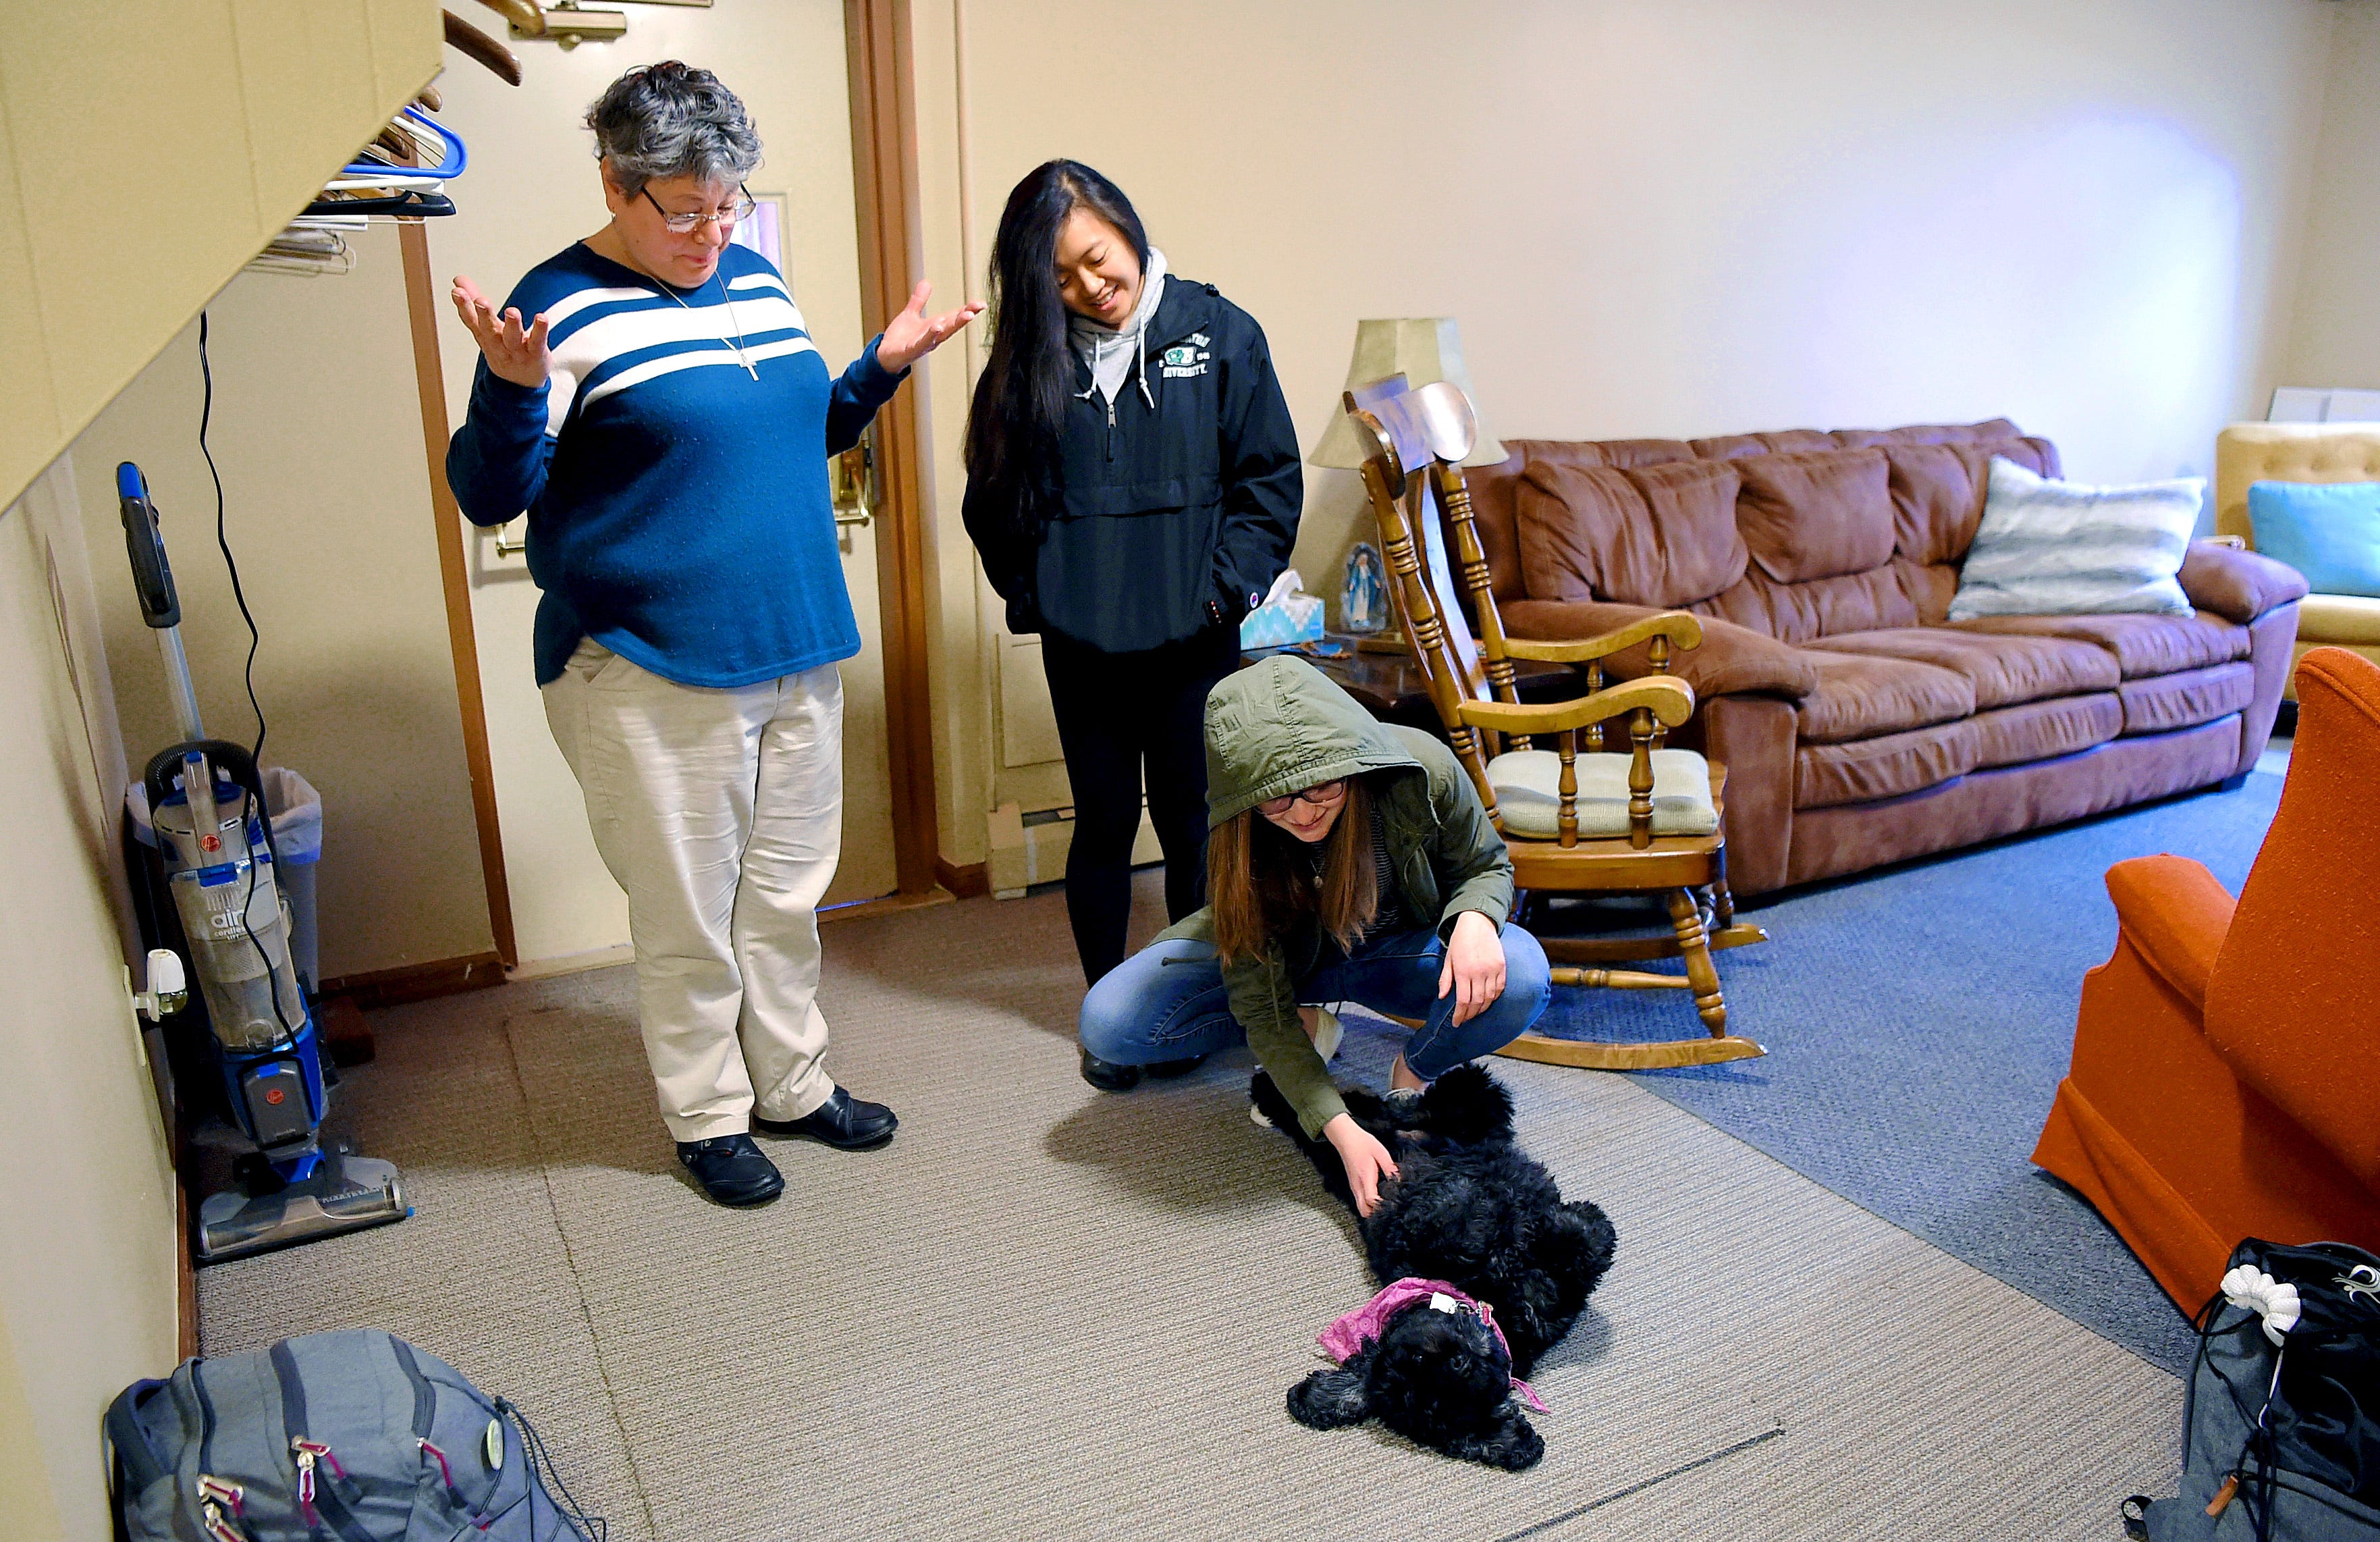 Catholic Church losing young members, but at Binghamton University, the faithful thrive